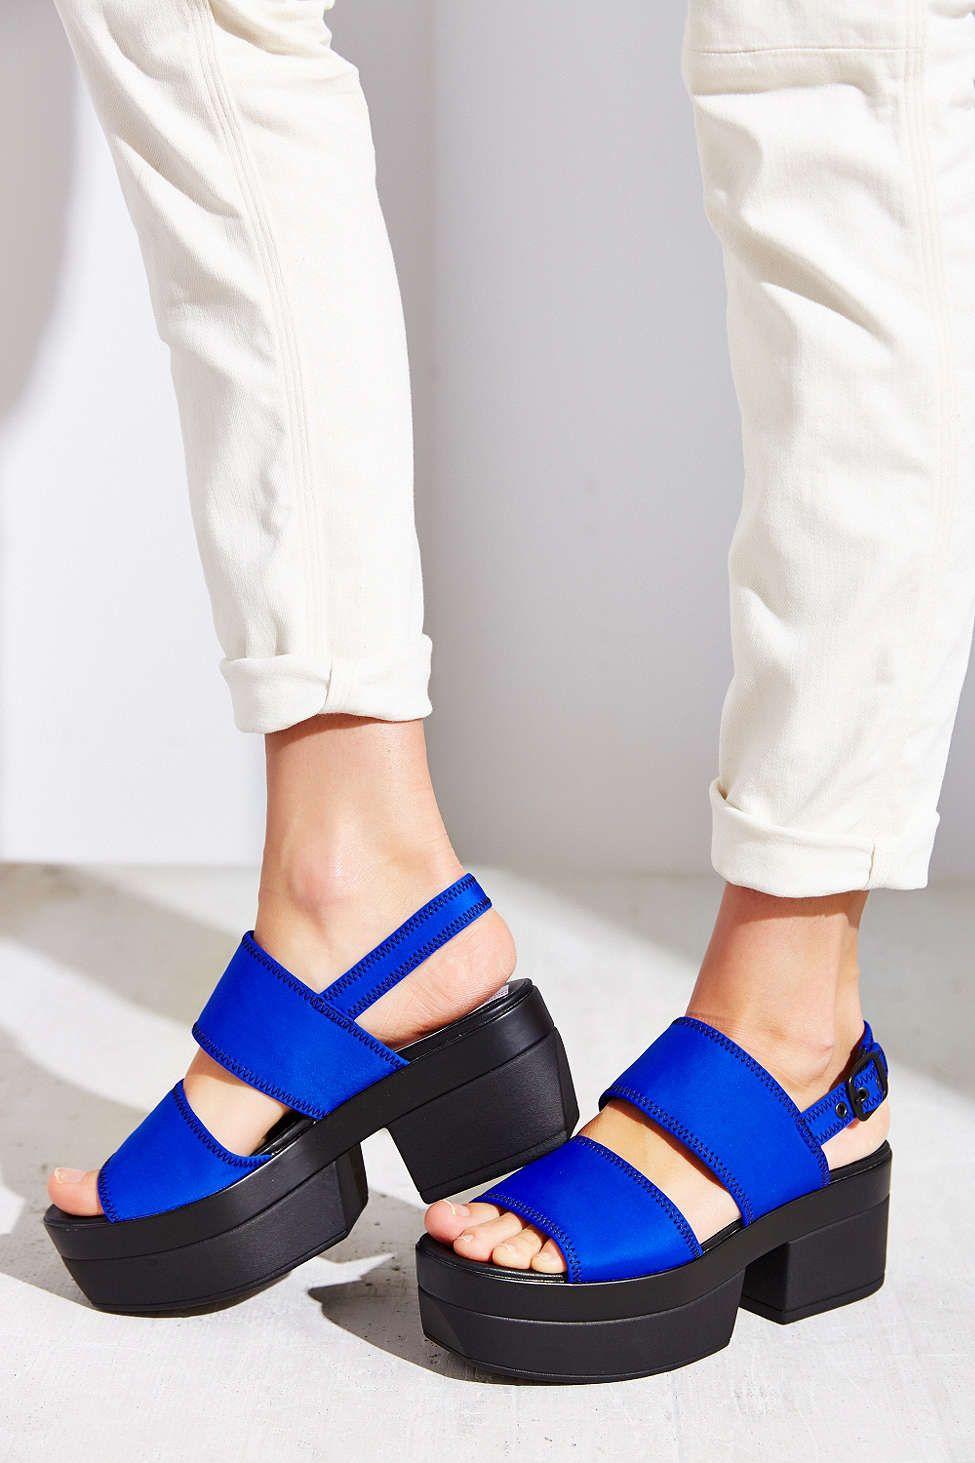 4cb5b75371a Vagabond Neoprene Sandals  blue  scuba  shoelust